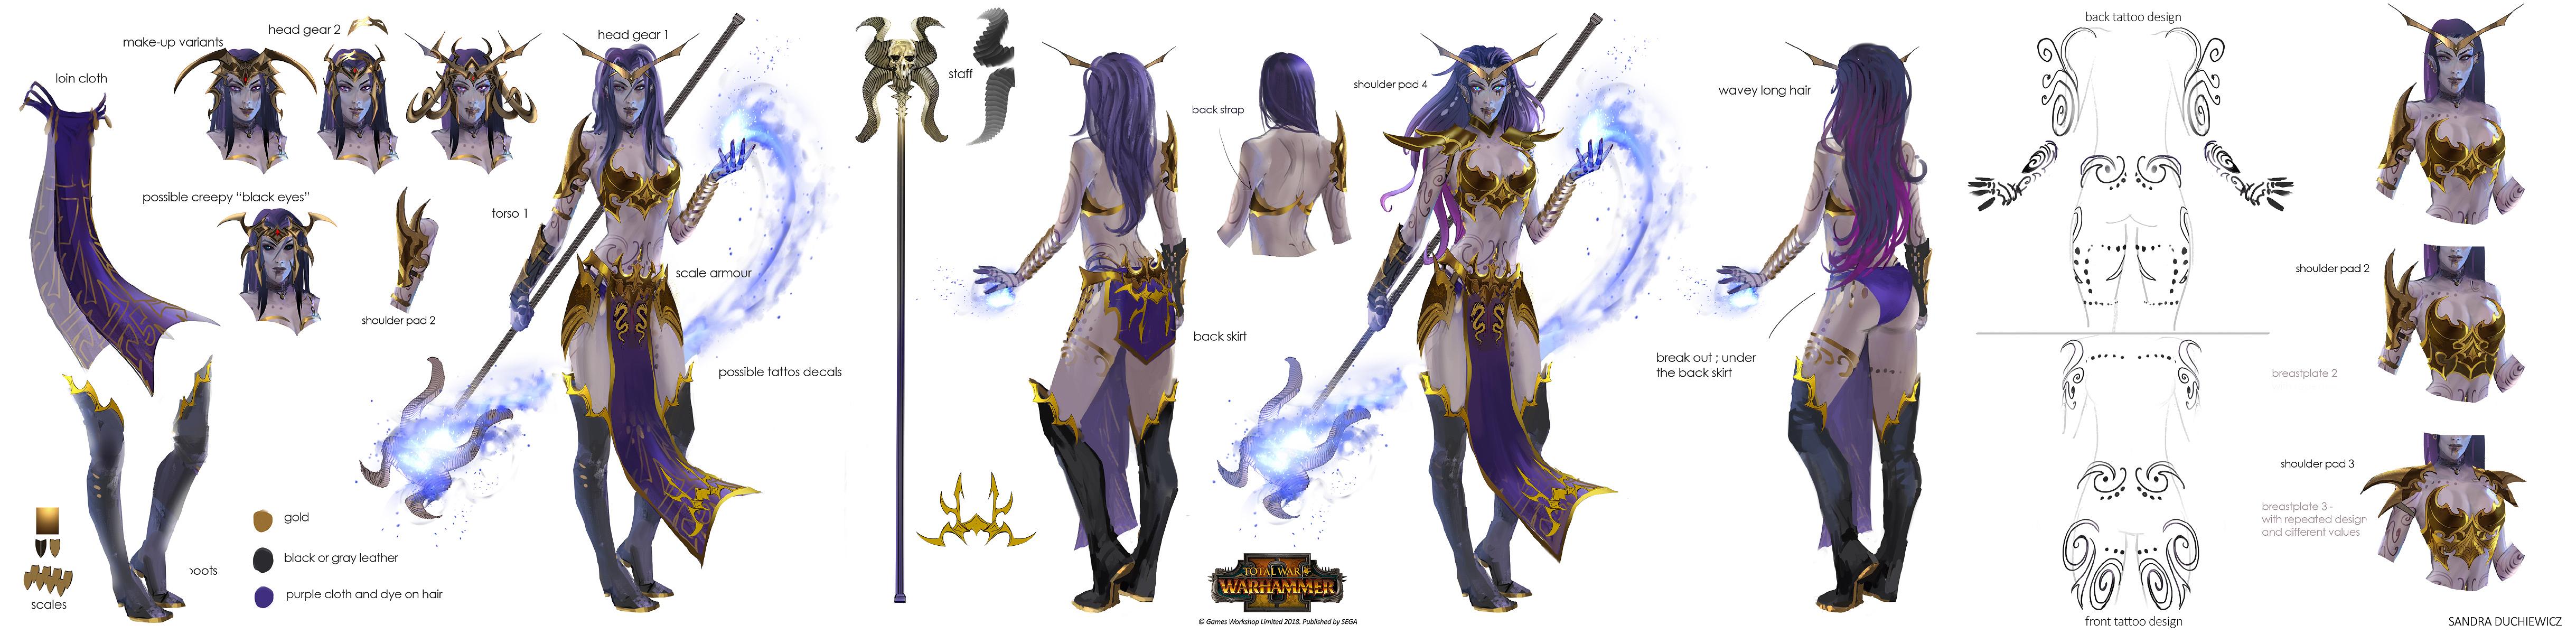 Total War Warhammer 2 - Supreme Sorceress